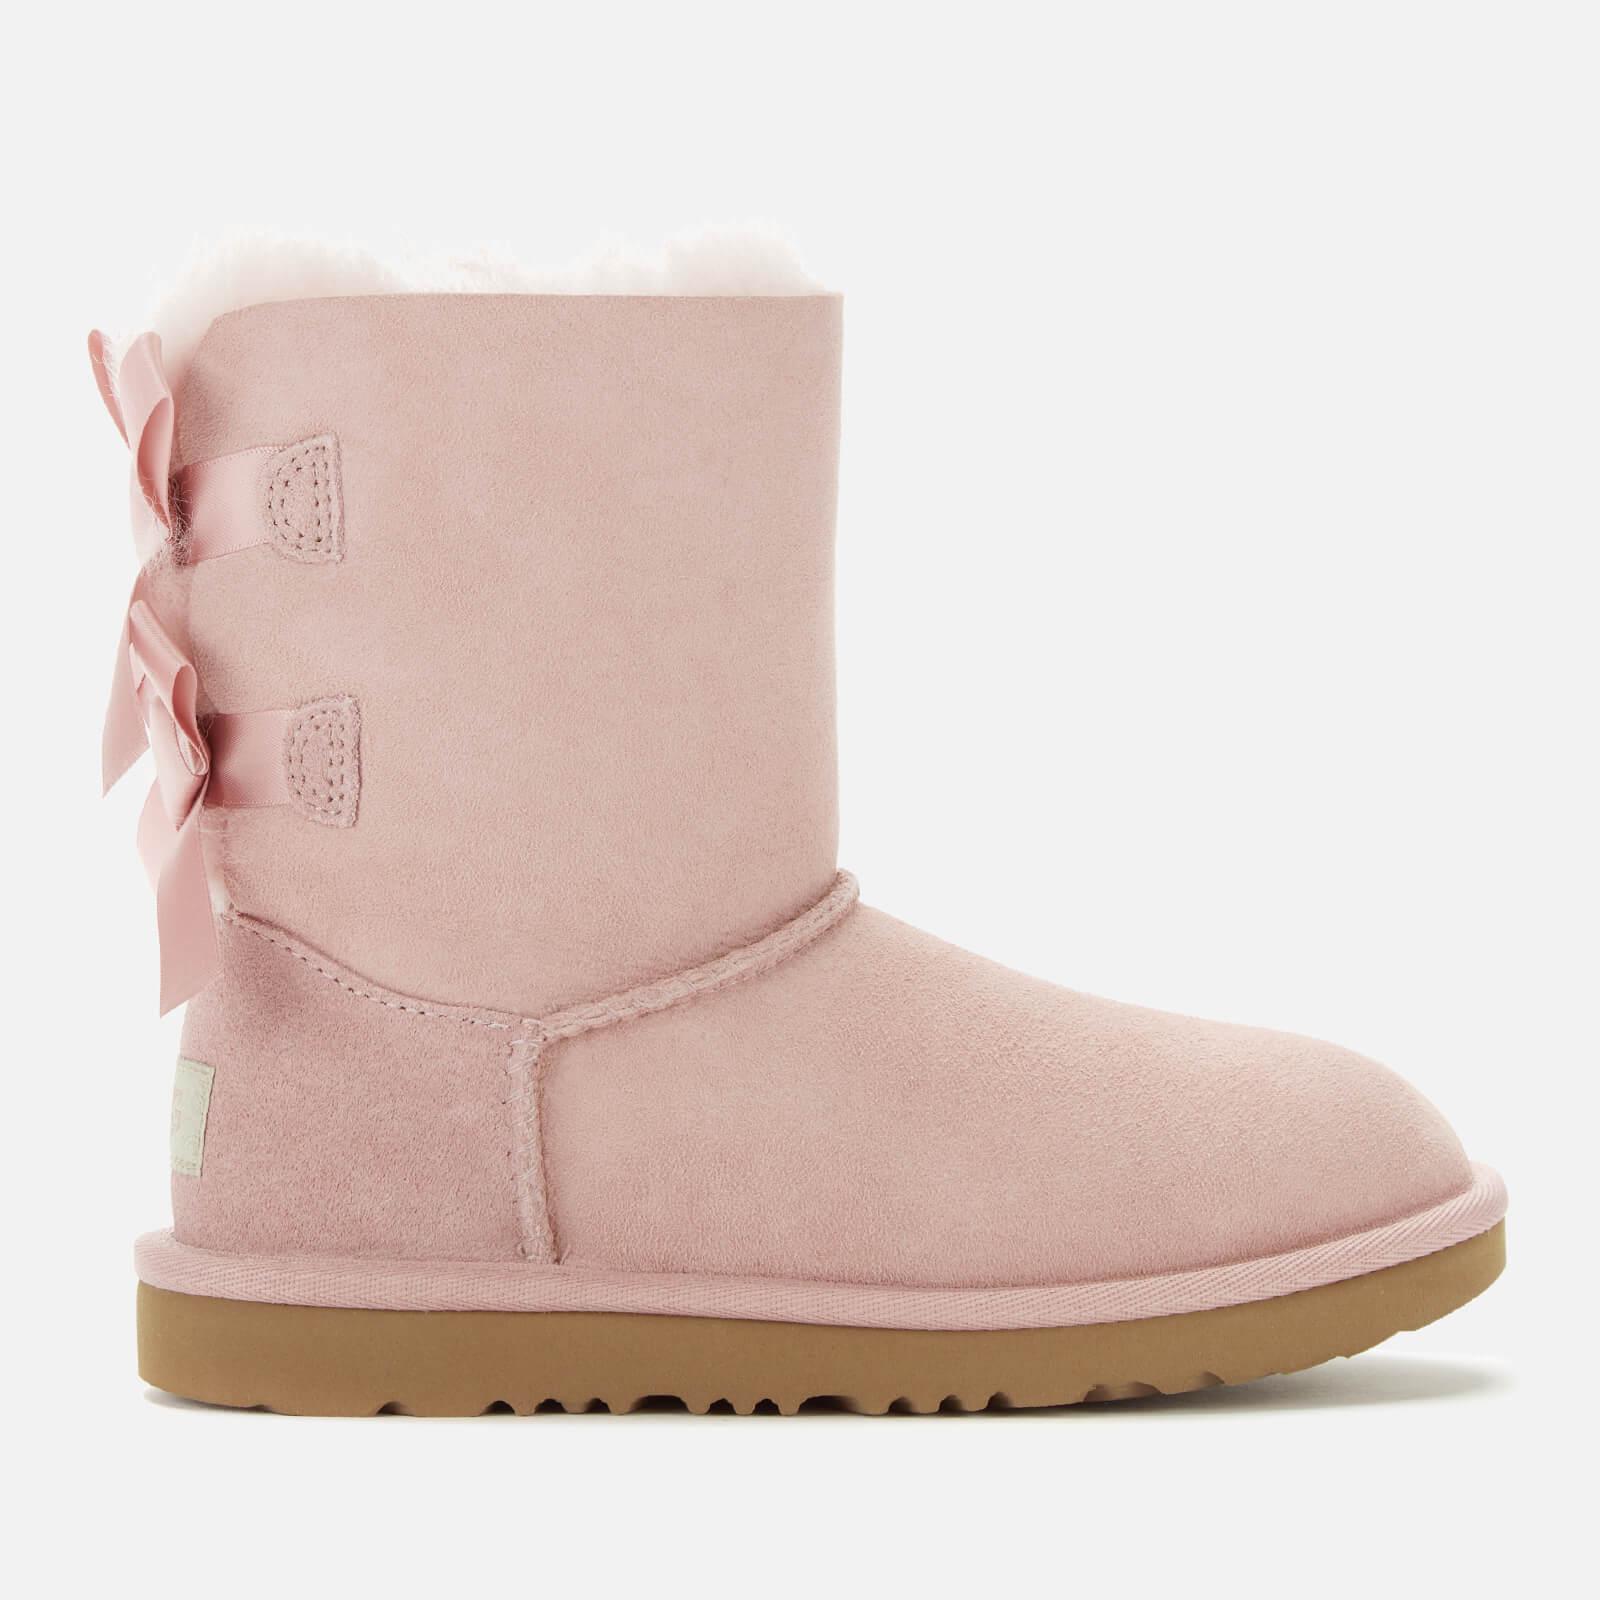 UGG Kids' Bailey Bow II Lace Back Sheepskin Boots - Pink Crystal - UK 12 Kids